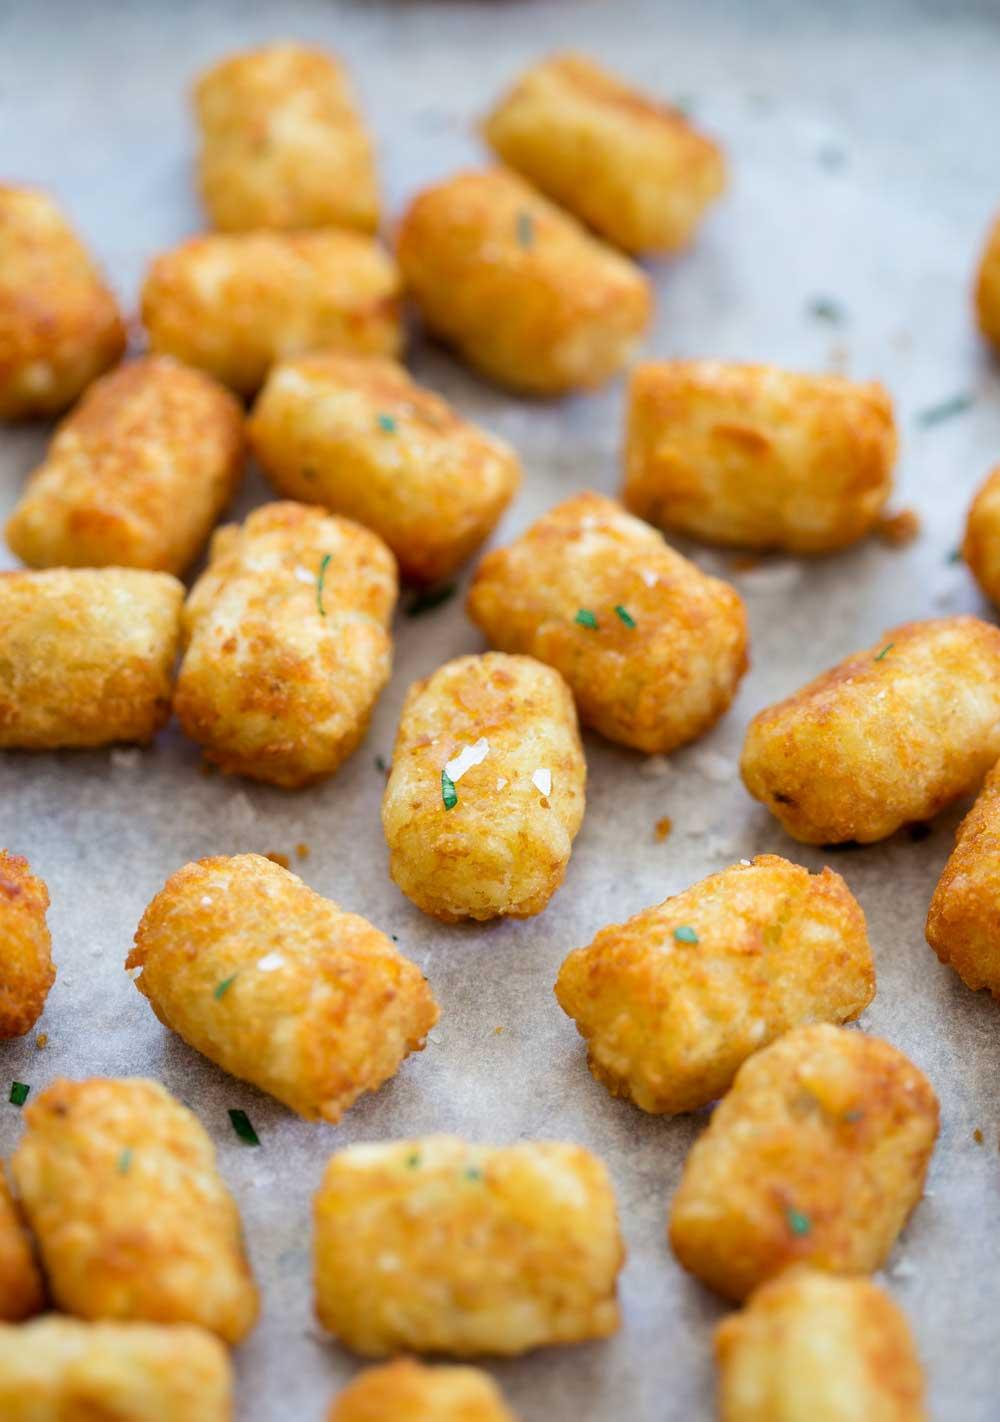 Homemade potato tots, shredded potato, cooked until crisp on the ...